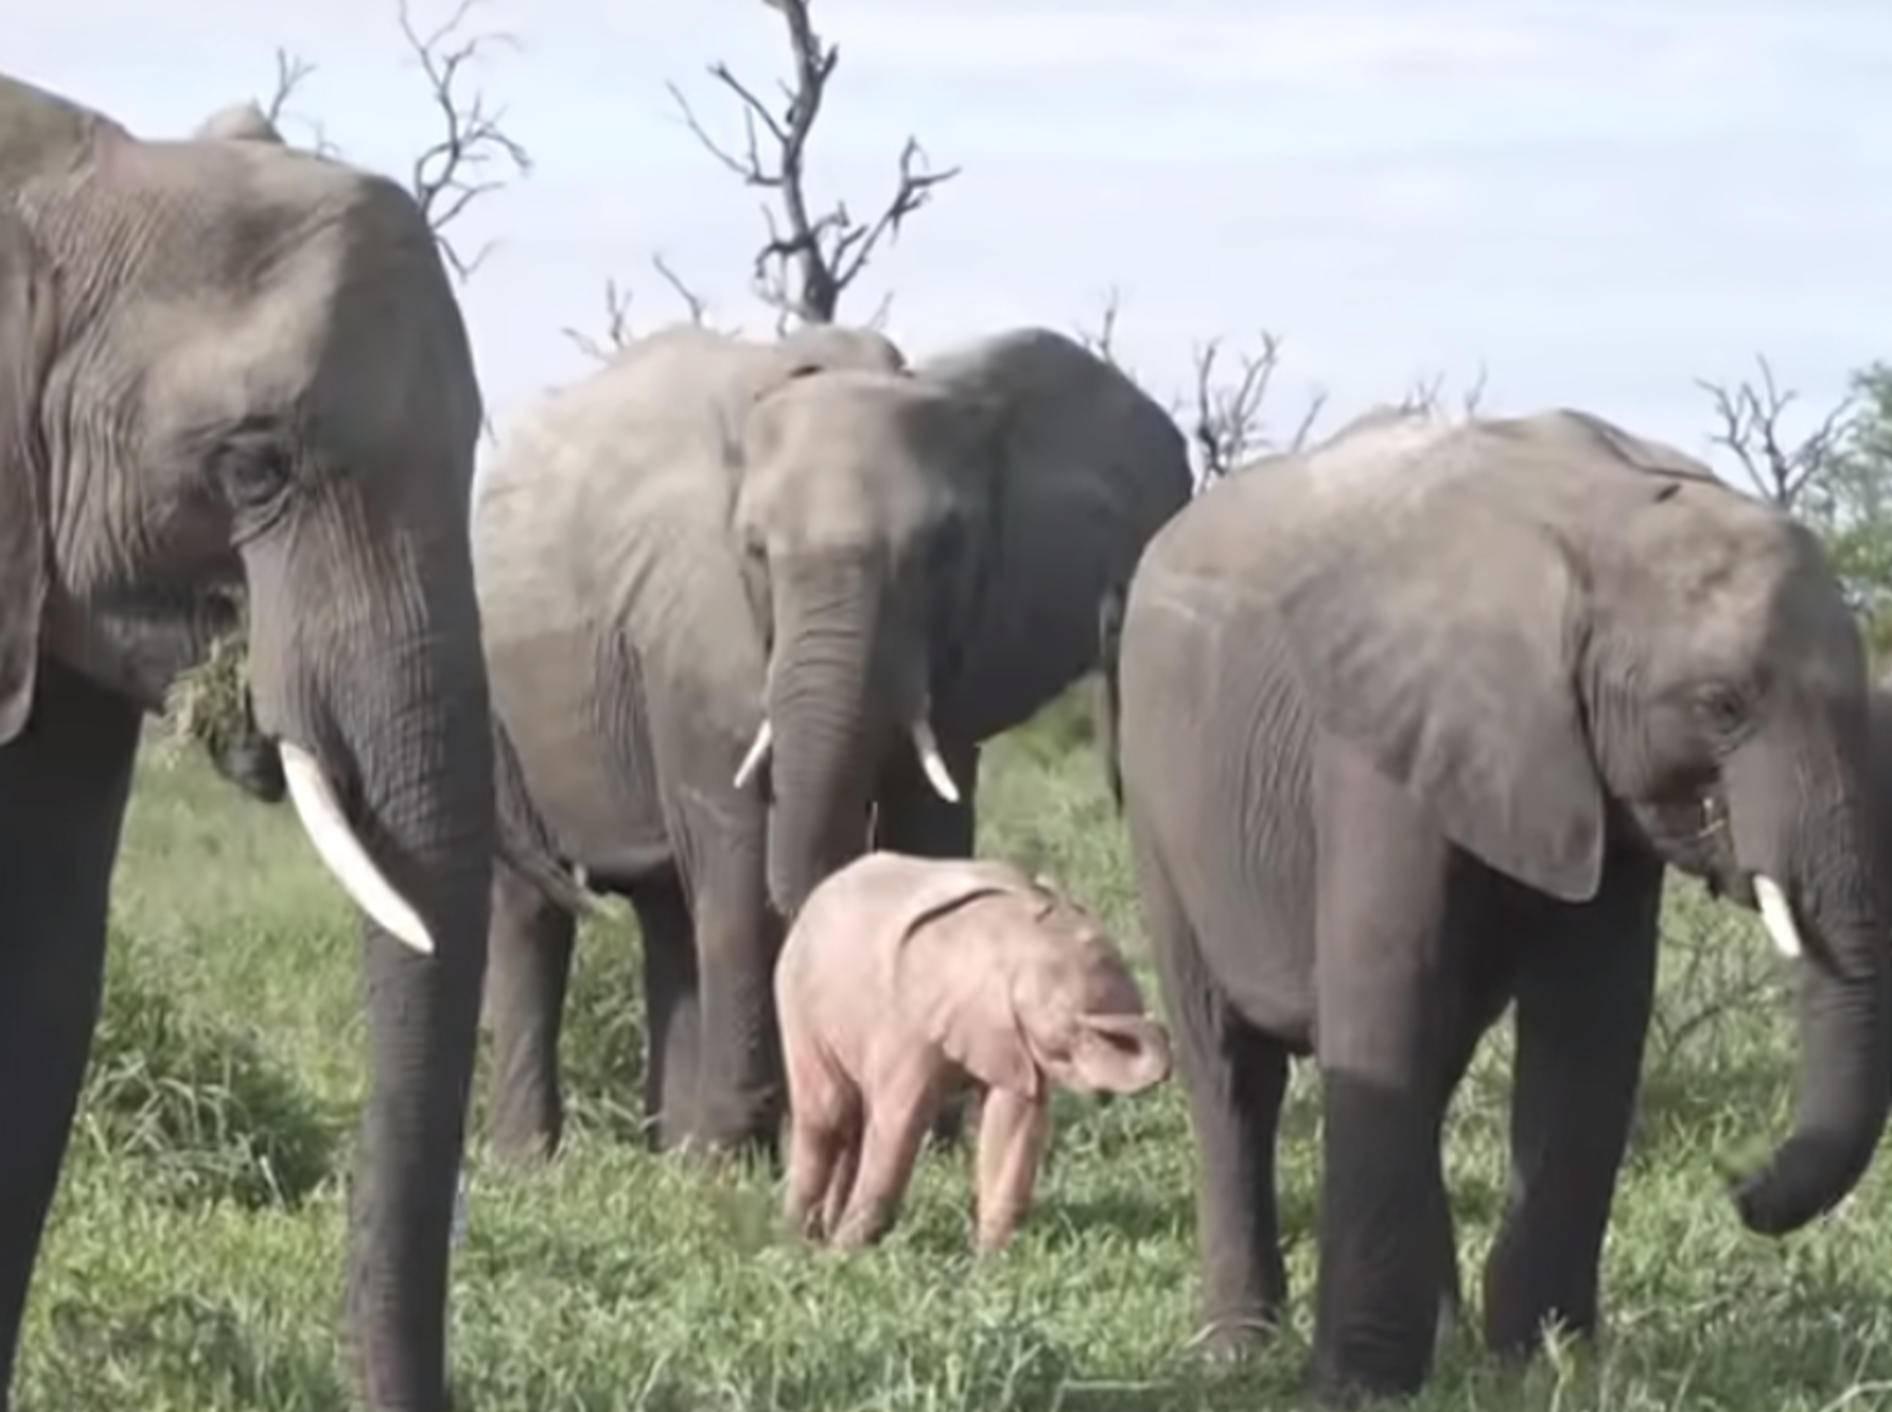 In Afrika bekamen Safari-Touristen ein rosa schimmerndes Elefanten-Baby zu Gesicht - Bild: YouTube / Caters Clips